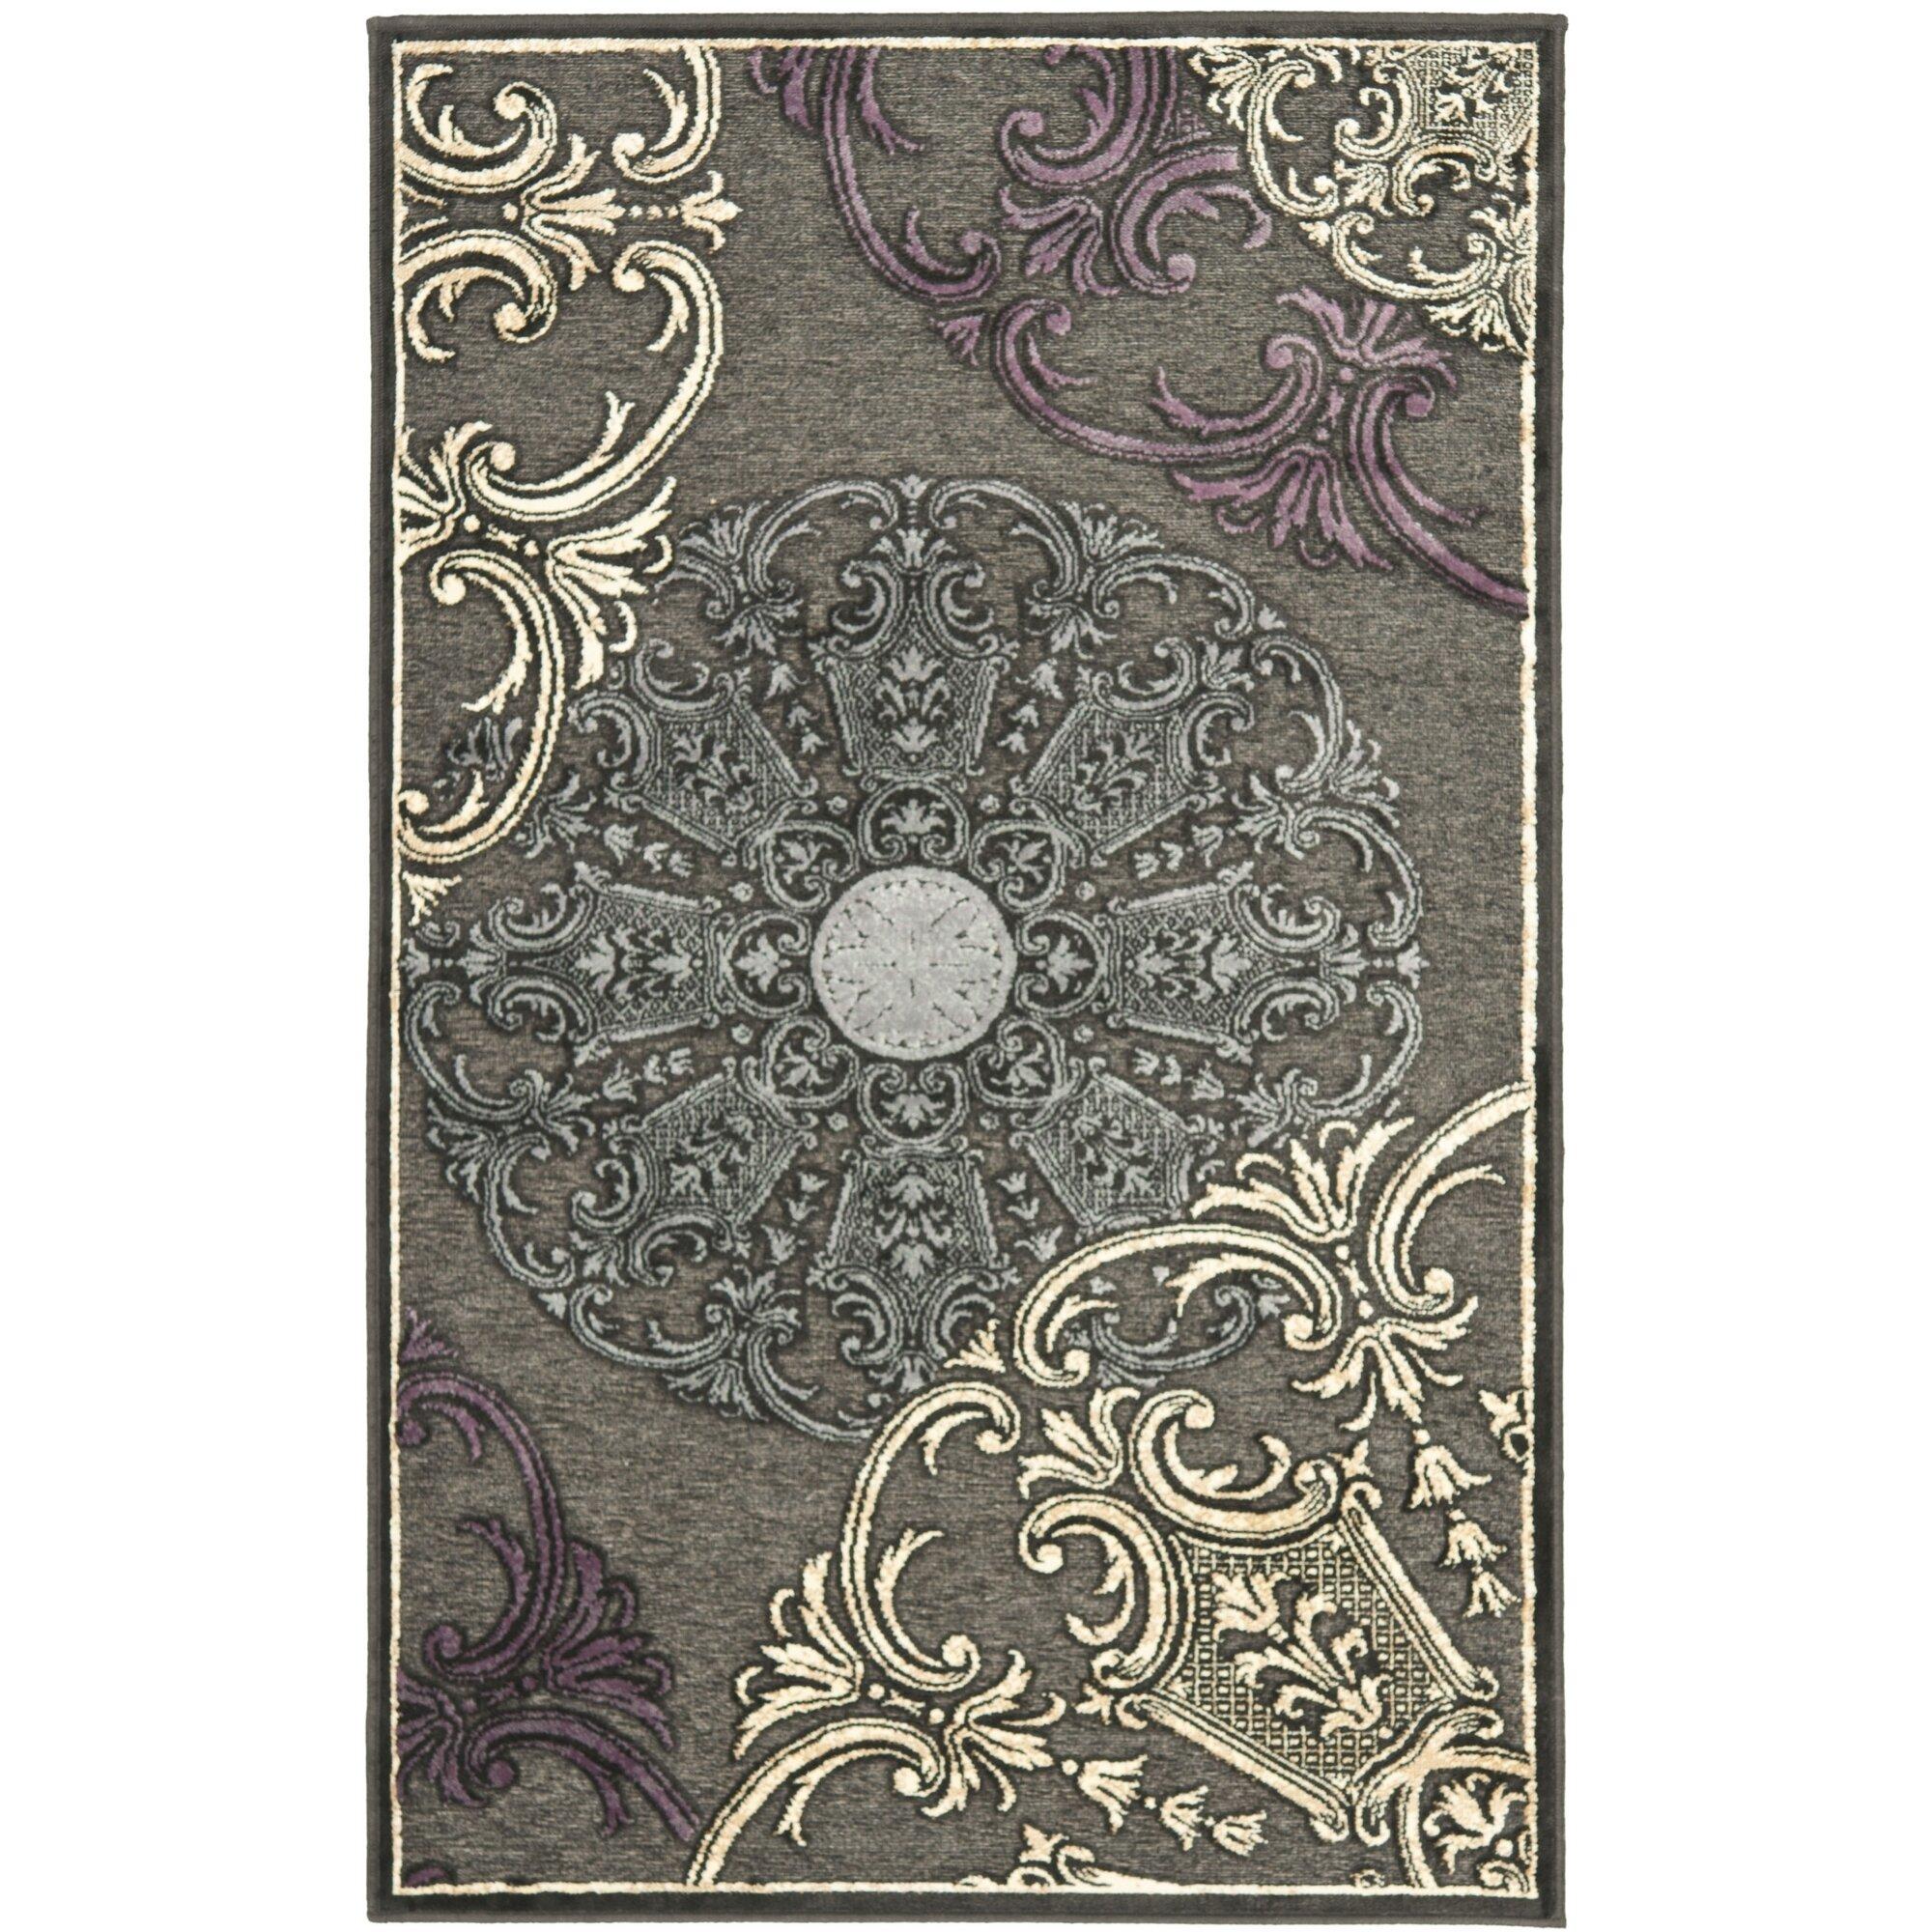 Safavieh Paradise Charcoal Floral Rug & Reviews